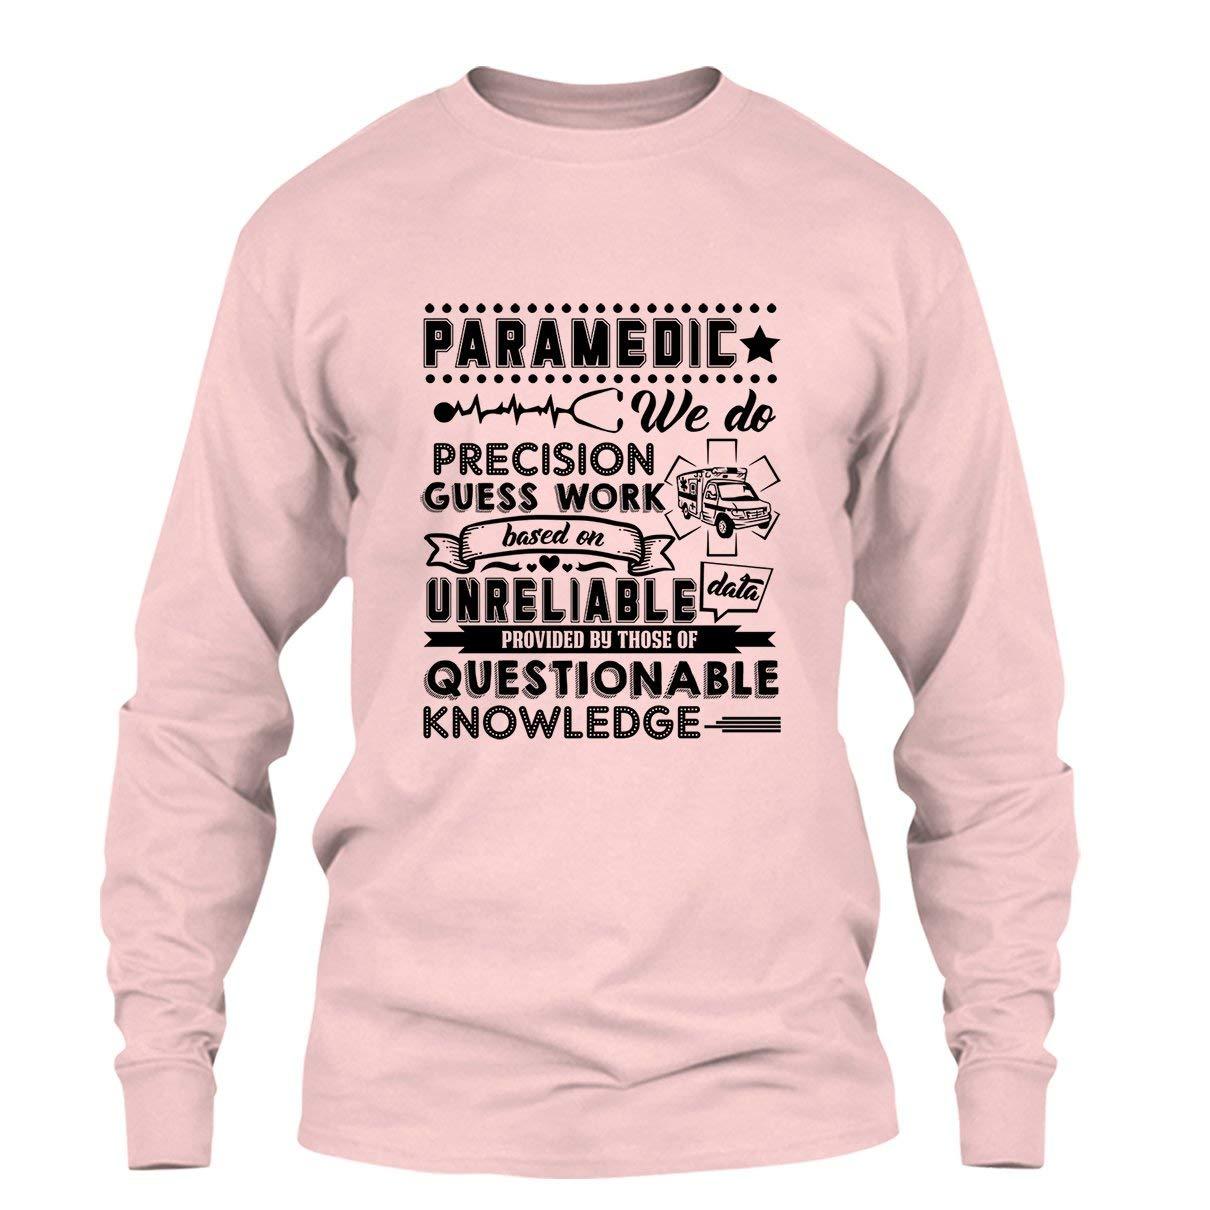 Amazon Proud Paramedic Shirt Long Sleeve Shirt Design Clothing